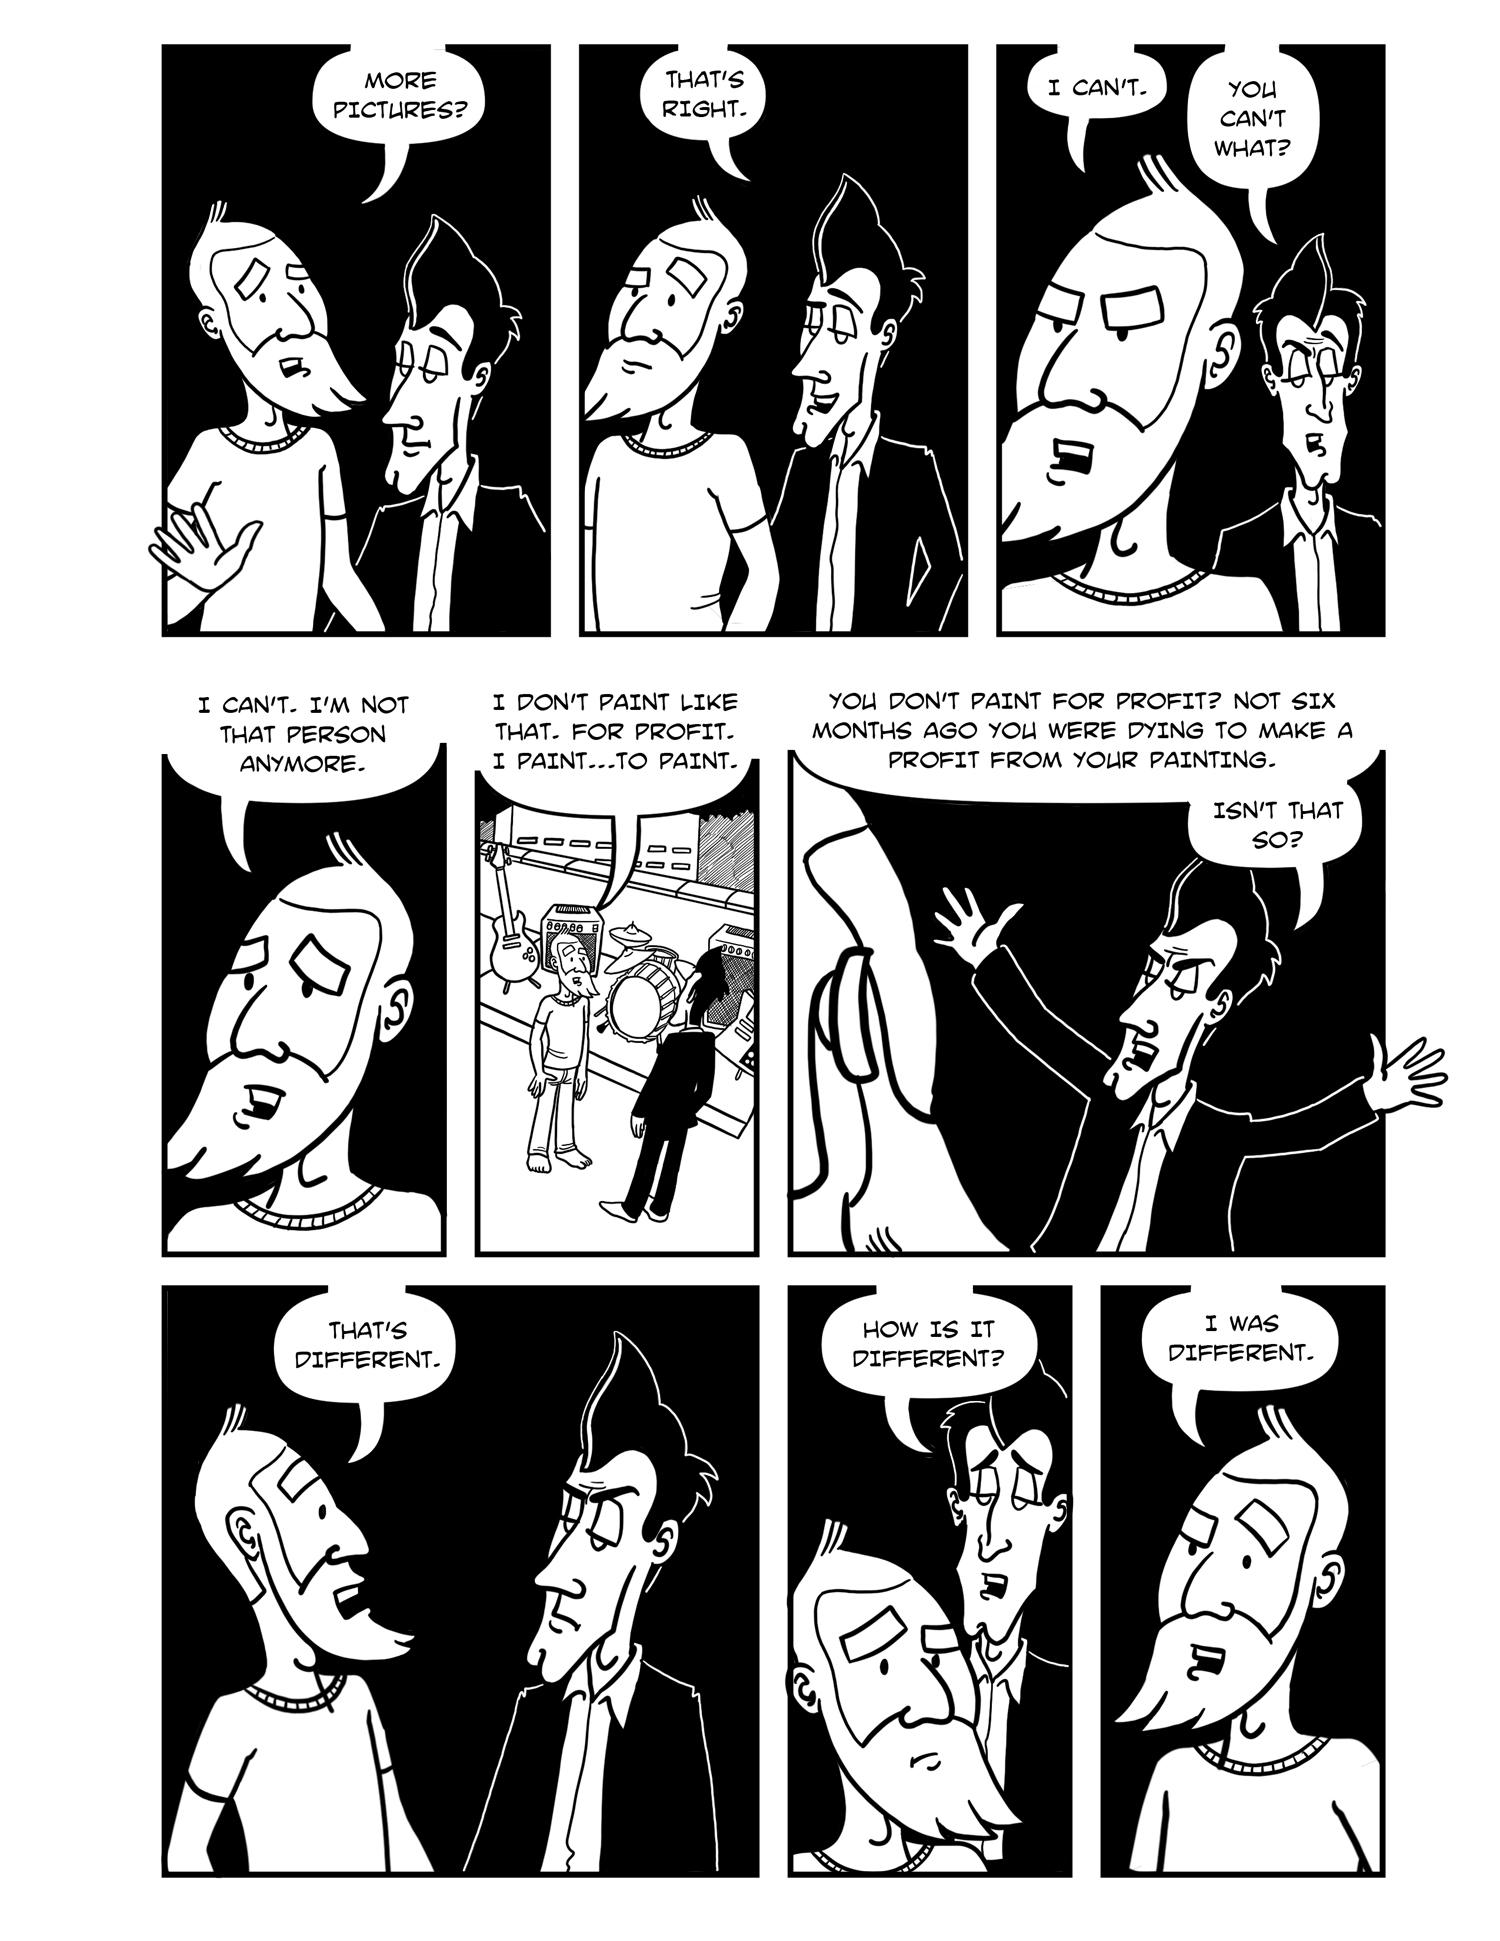 PAGE-209.jpg